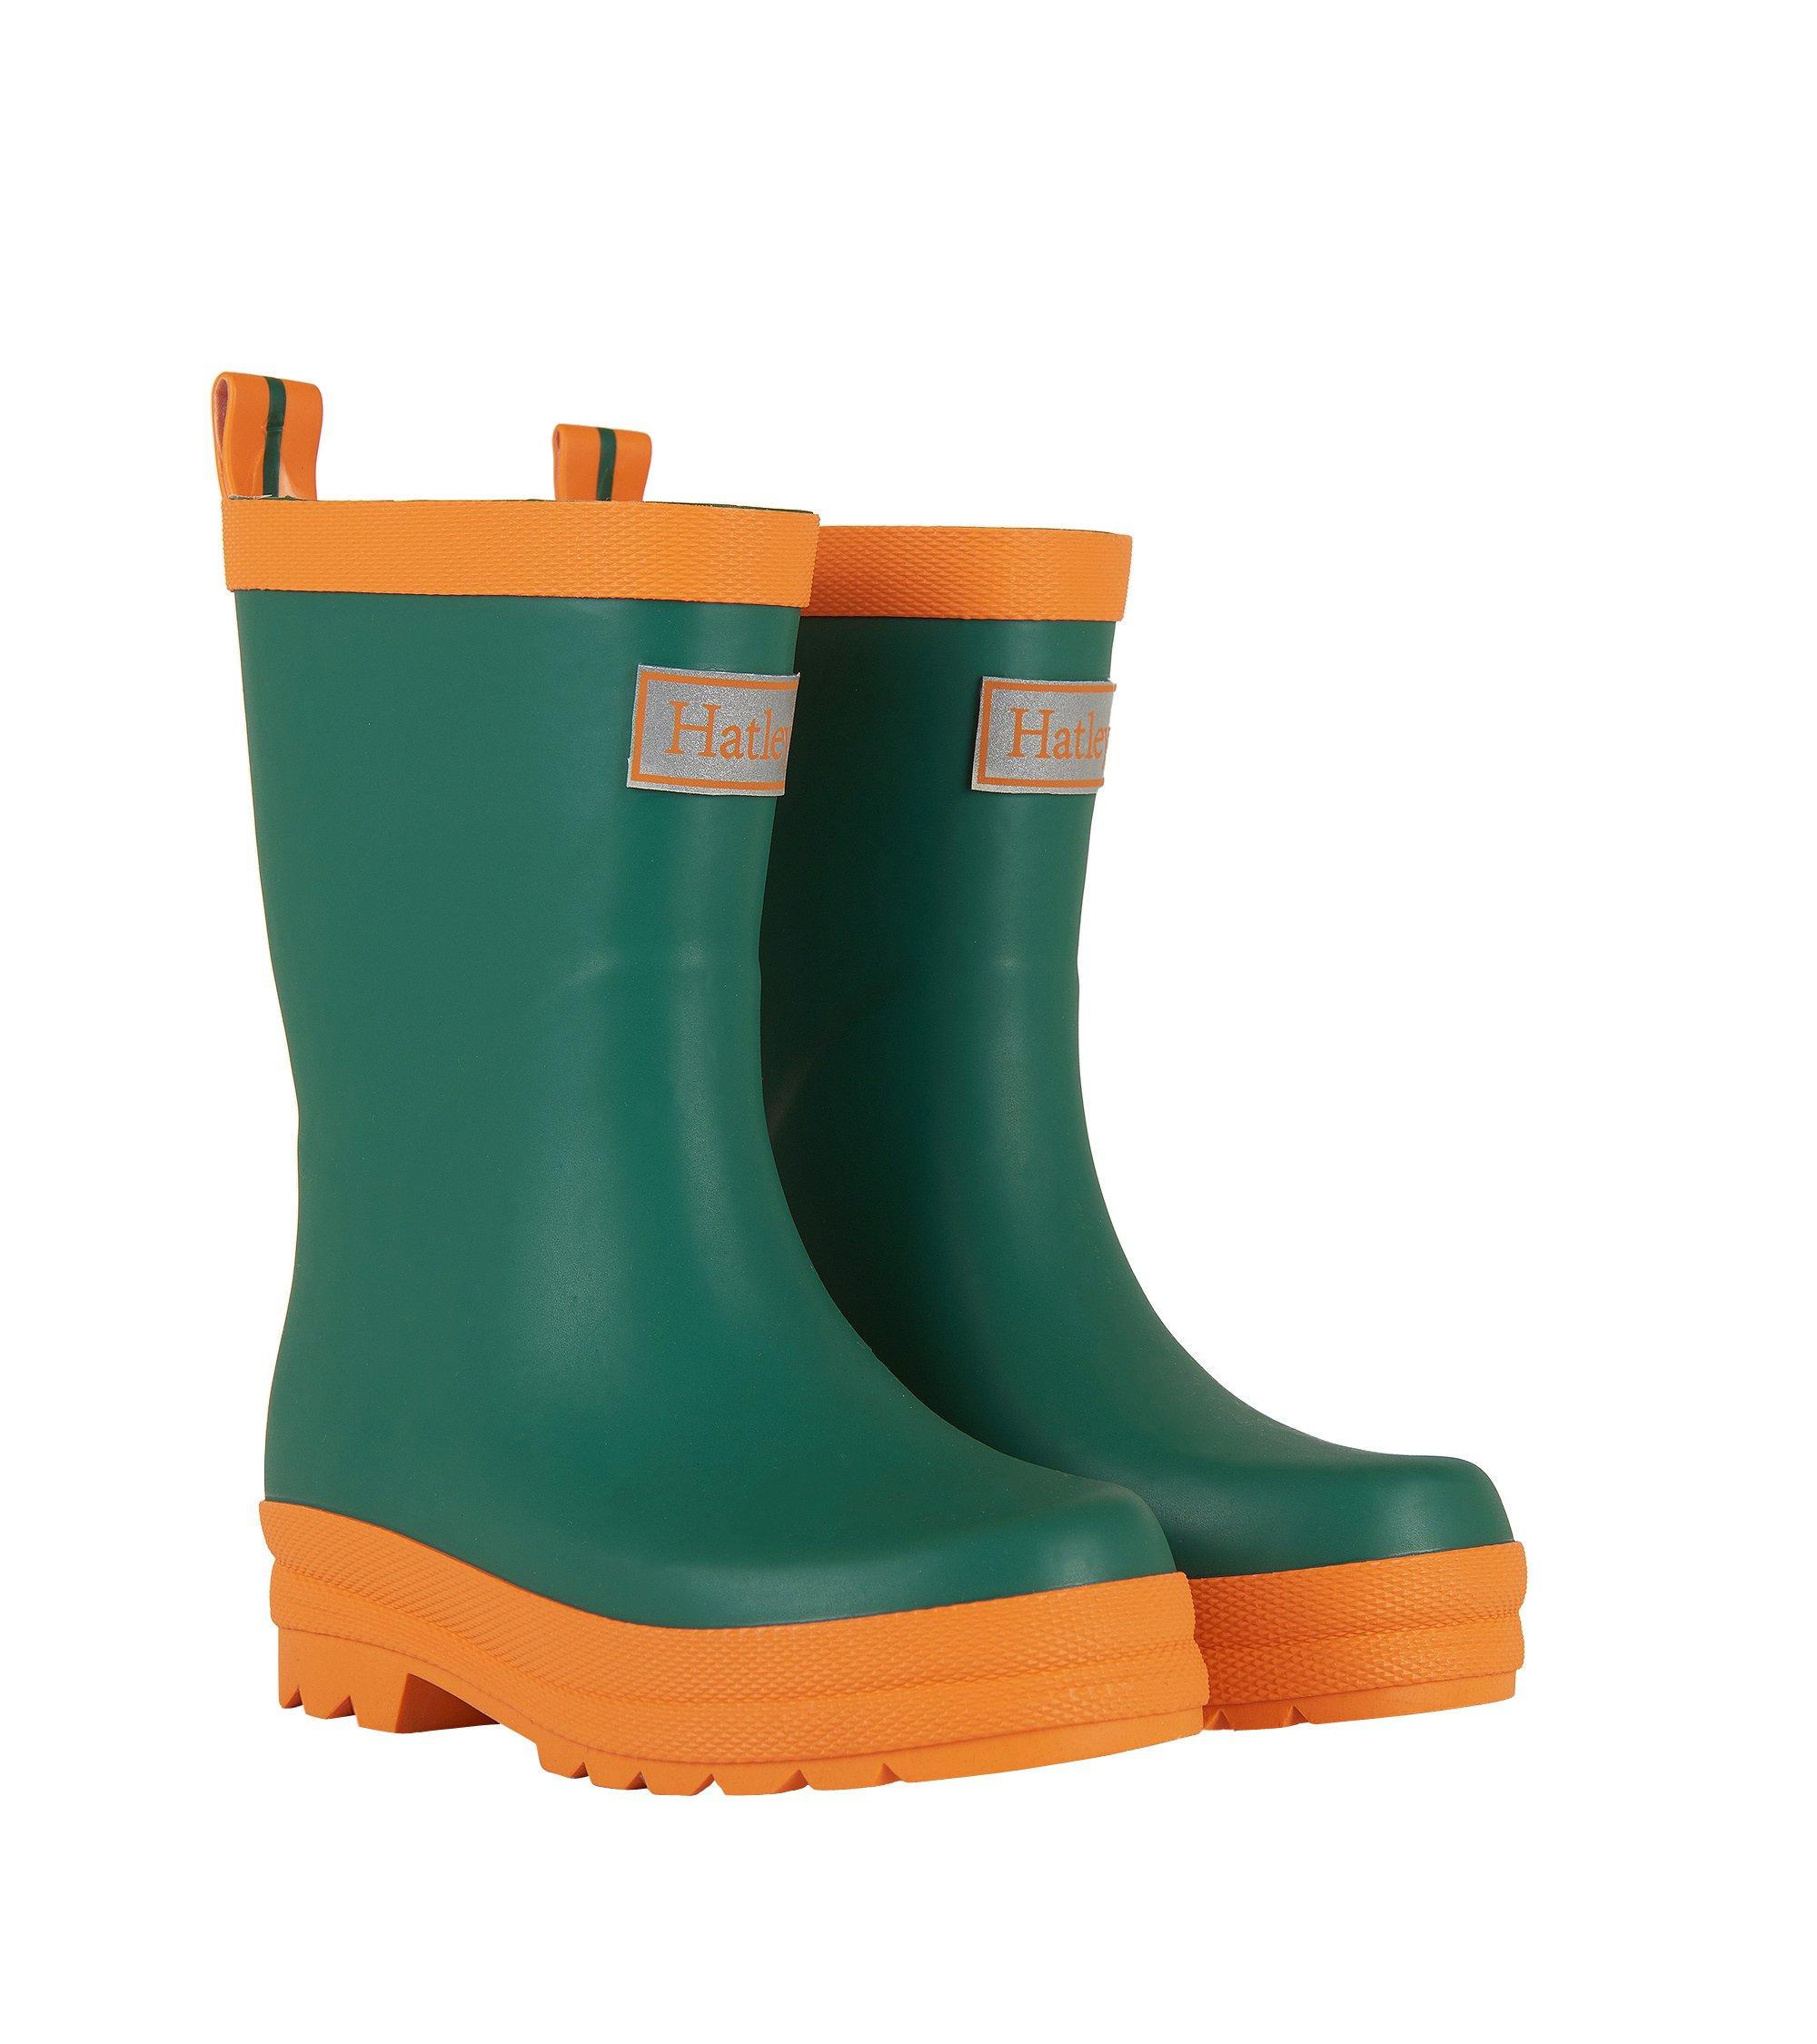 Hatley Classic Boots Rain Accessory, Green and Orange, 10 M US Little Kid